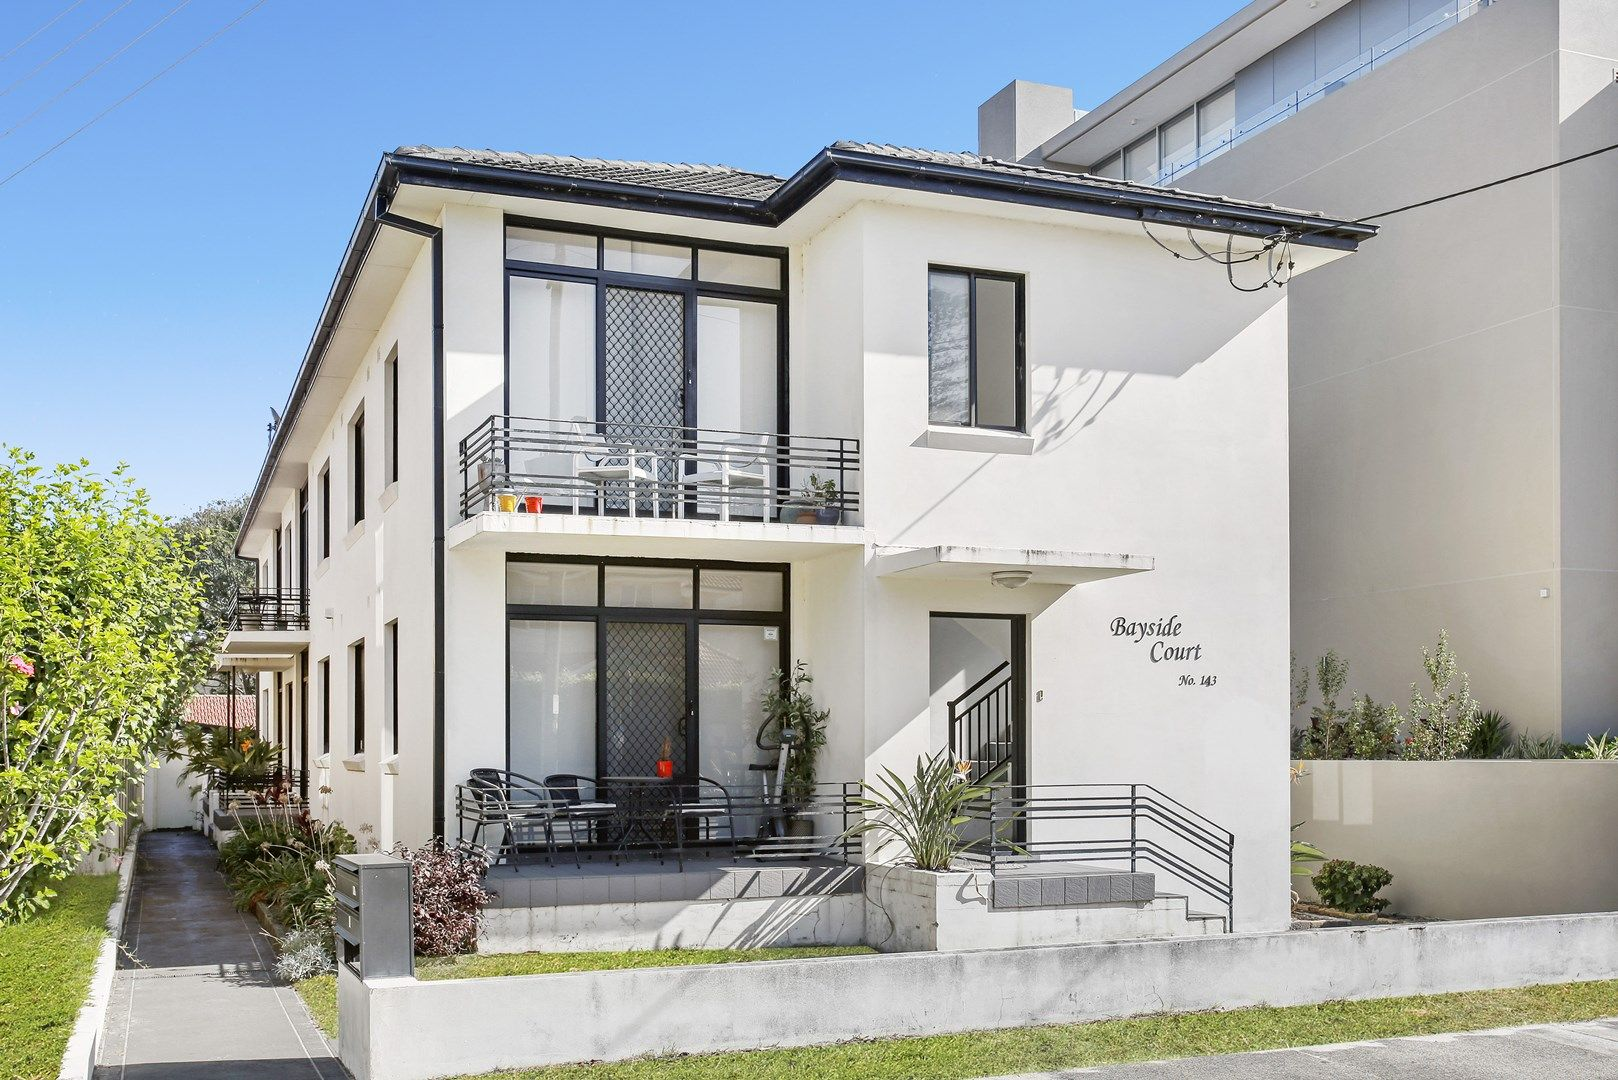 3/143 Clareville Avenue, Sandringham NSW 2219, Image 0